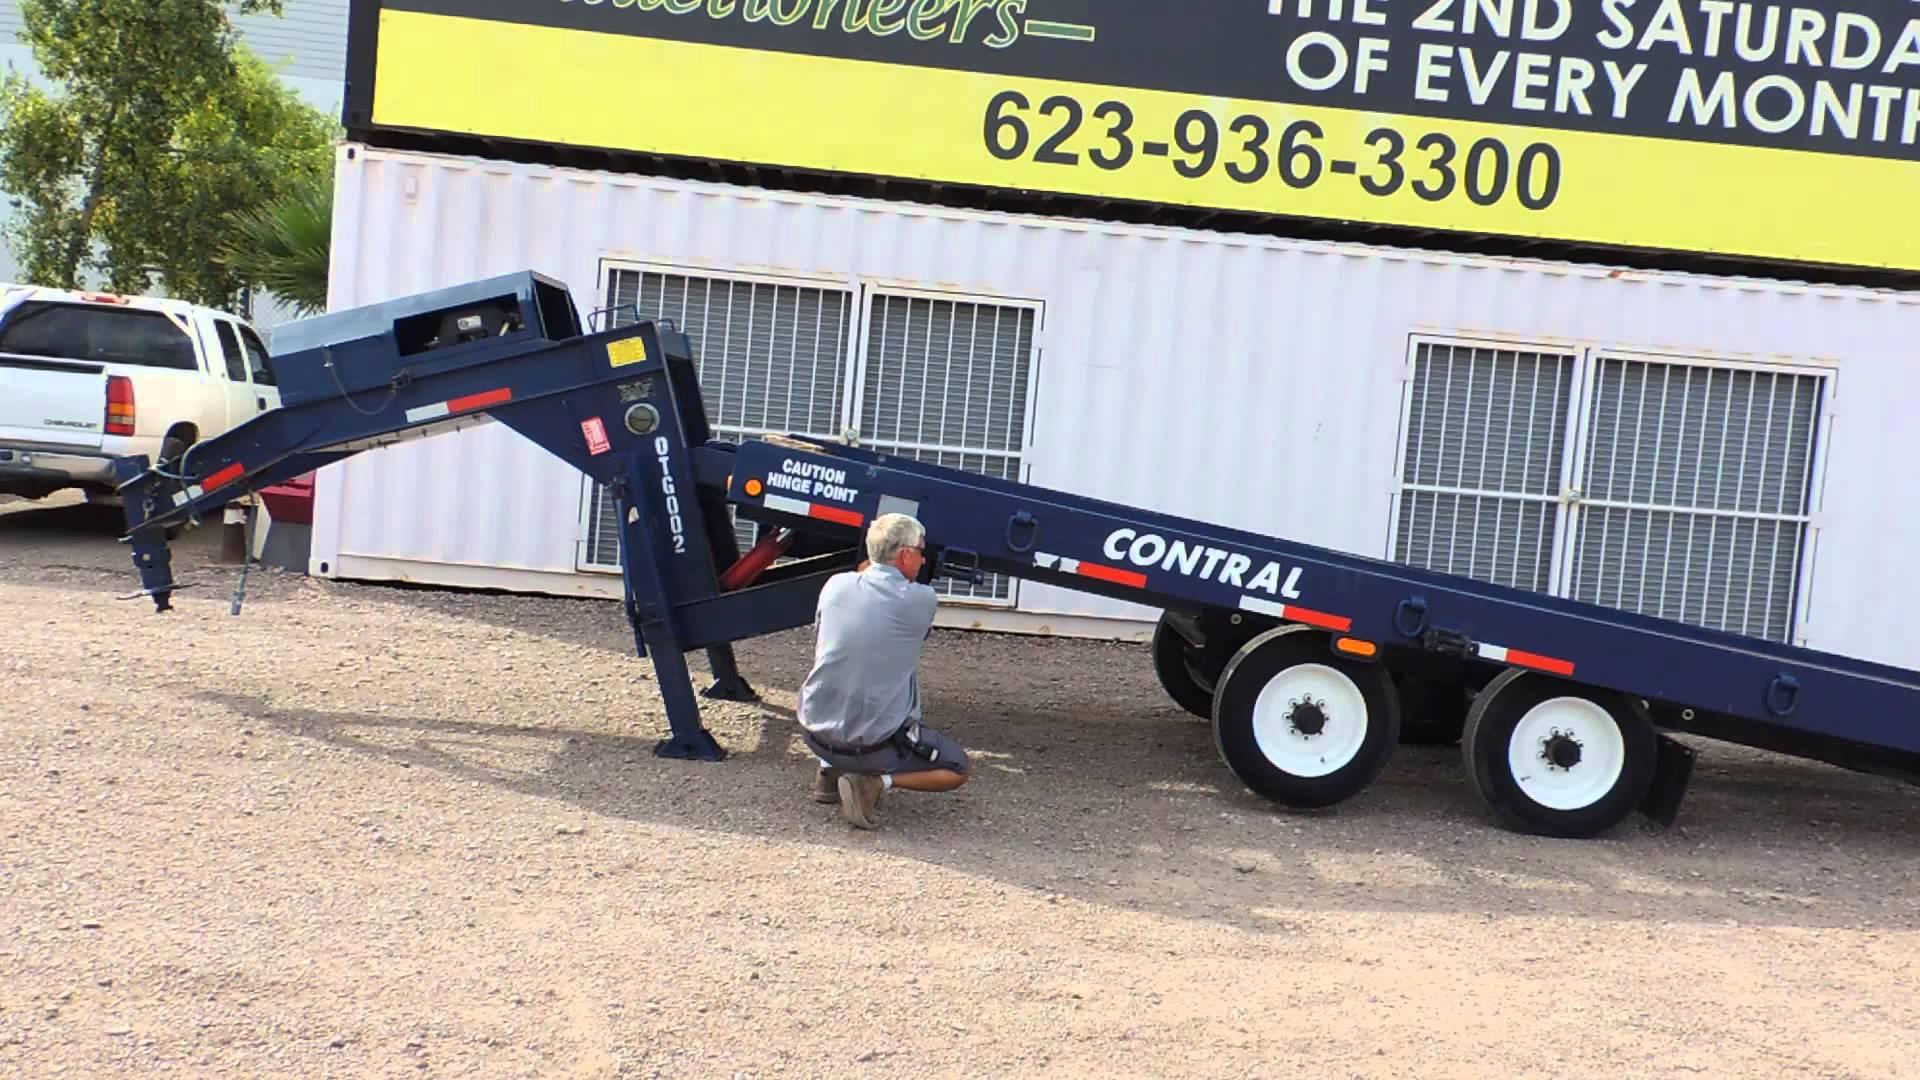 2012 Lucon 10t322cdu6 26 Gooseneck Hydraulic Tilt Trailer At Public with regard to size 1920 X 1080